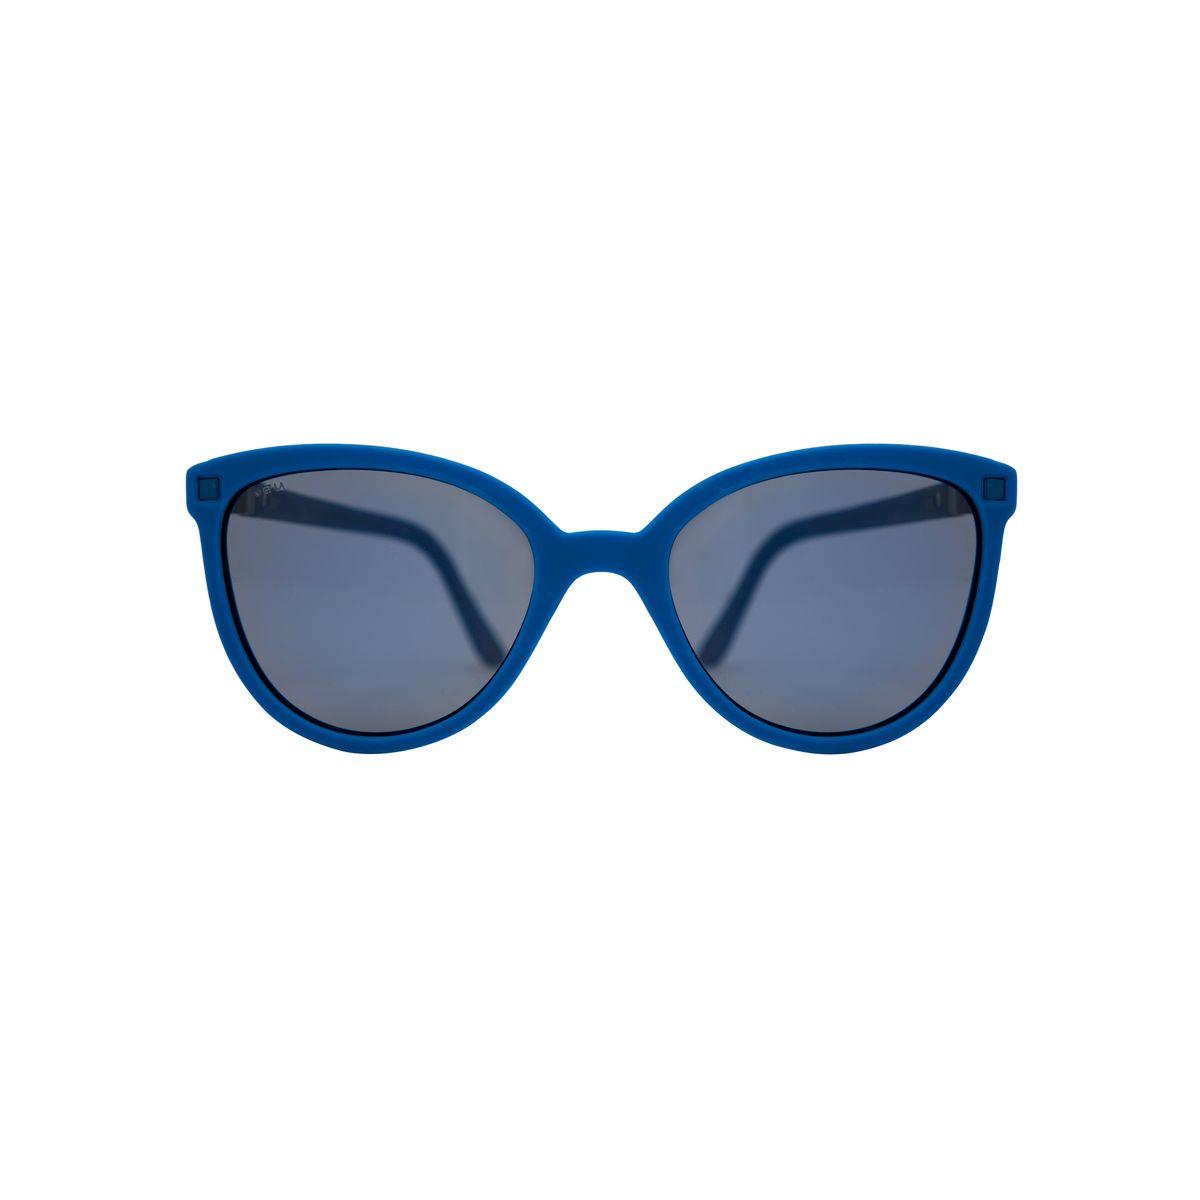 KiETLA CraZyg-Zag slnečné okuliare BuZZ 4-6 rokov